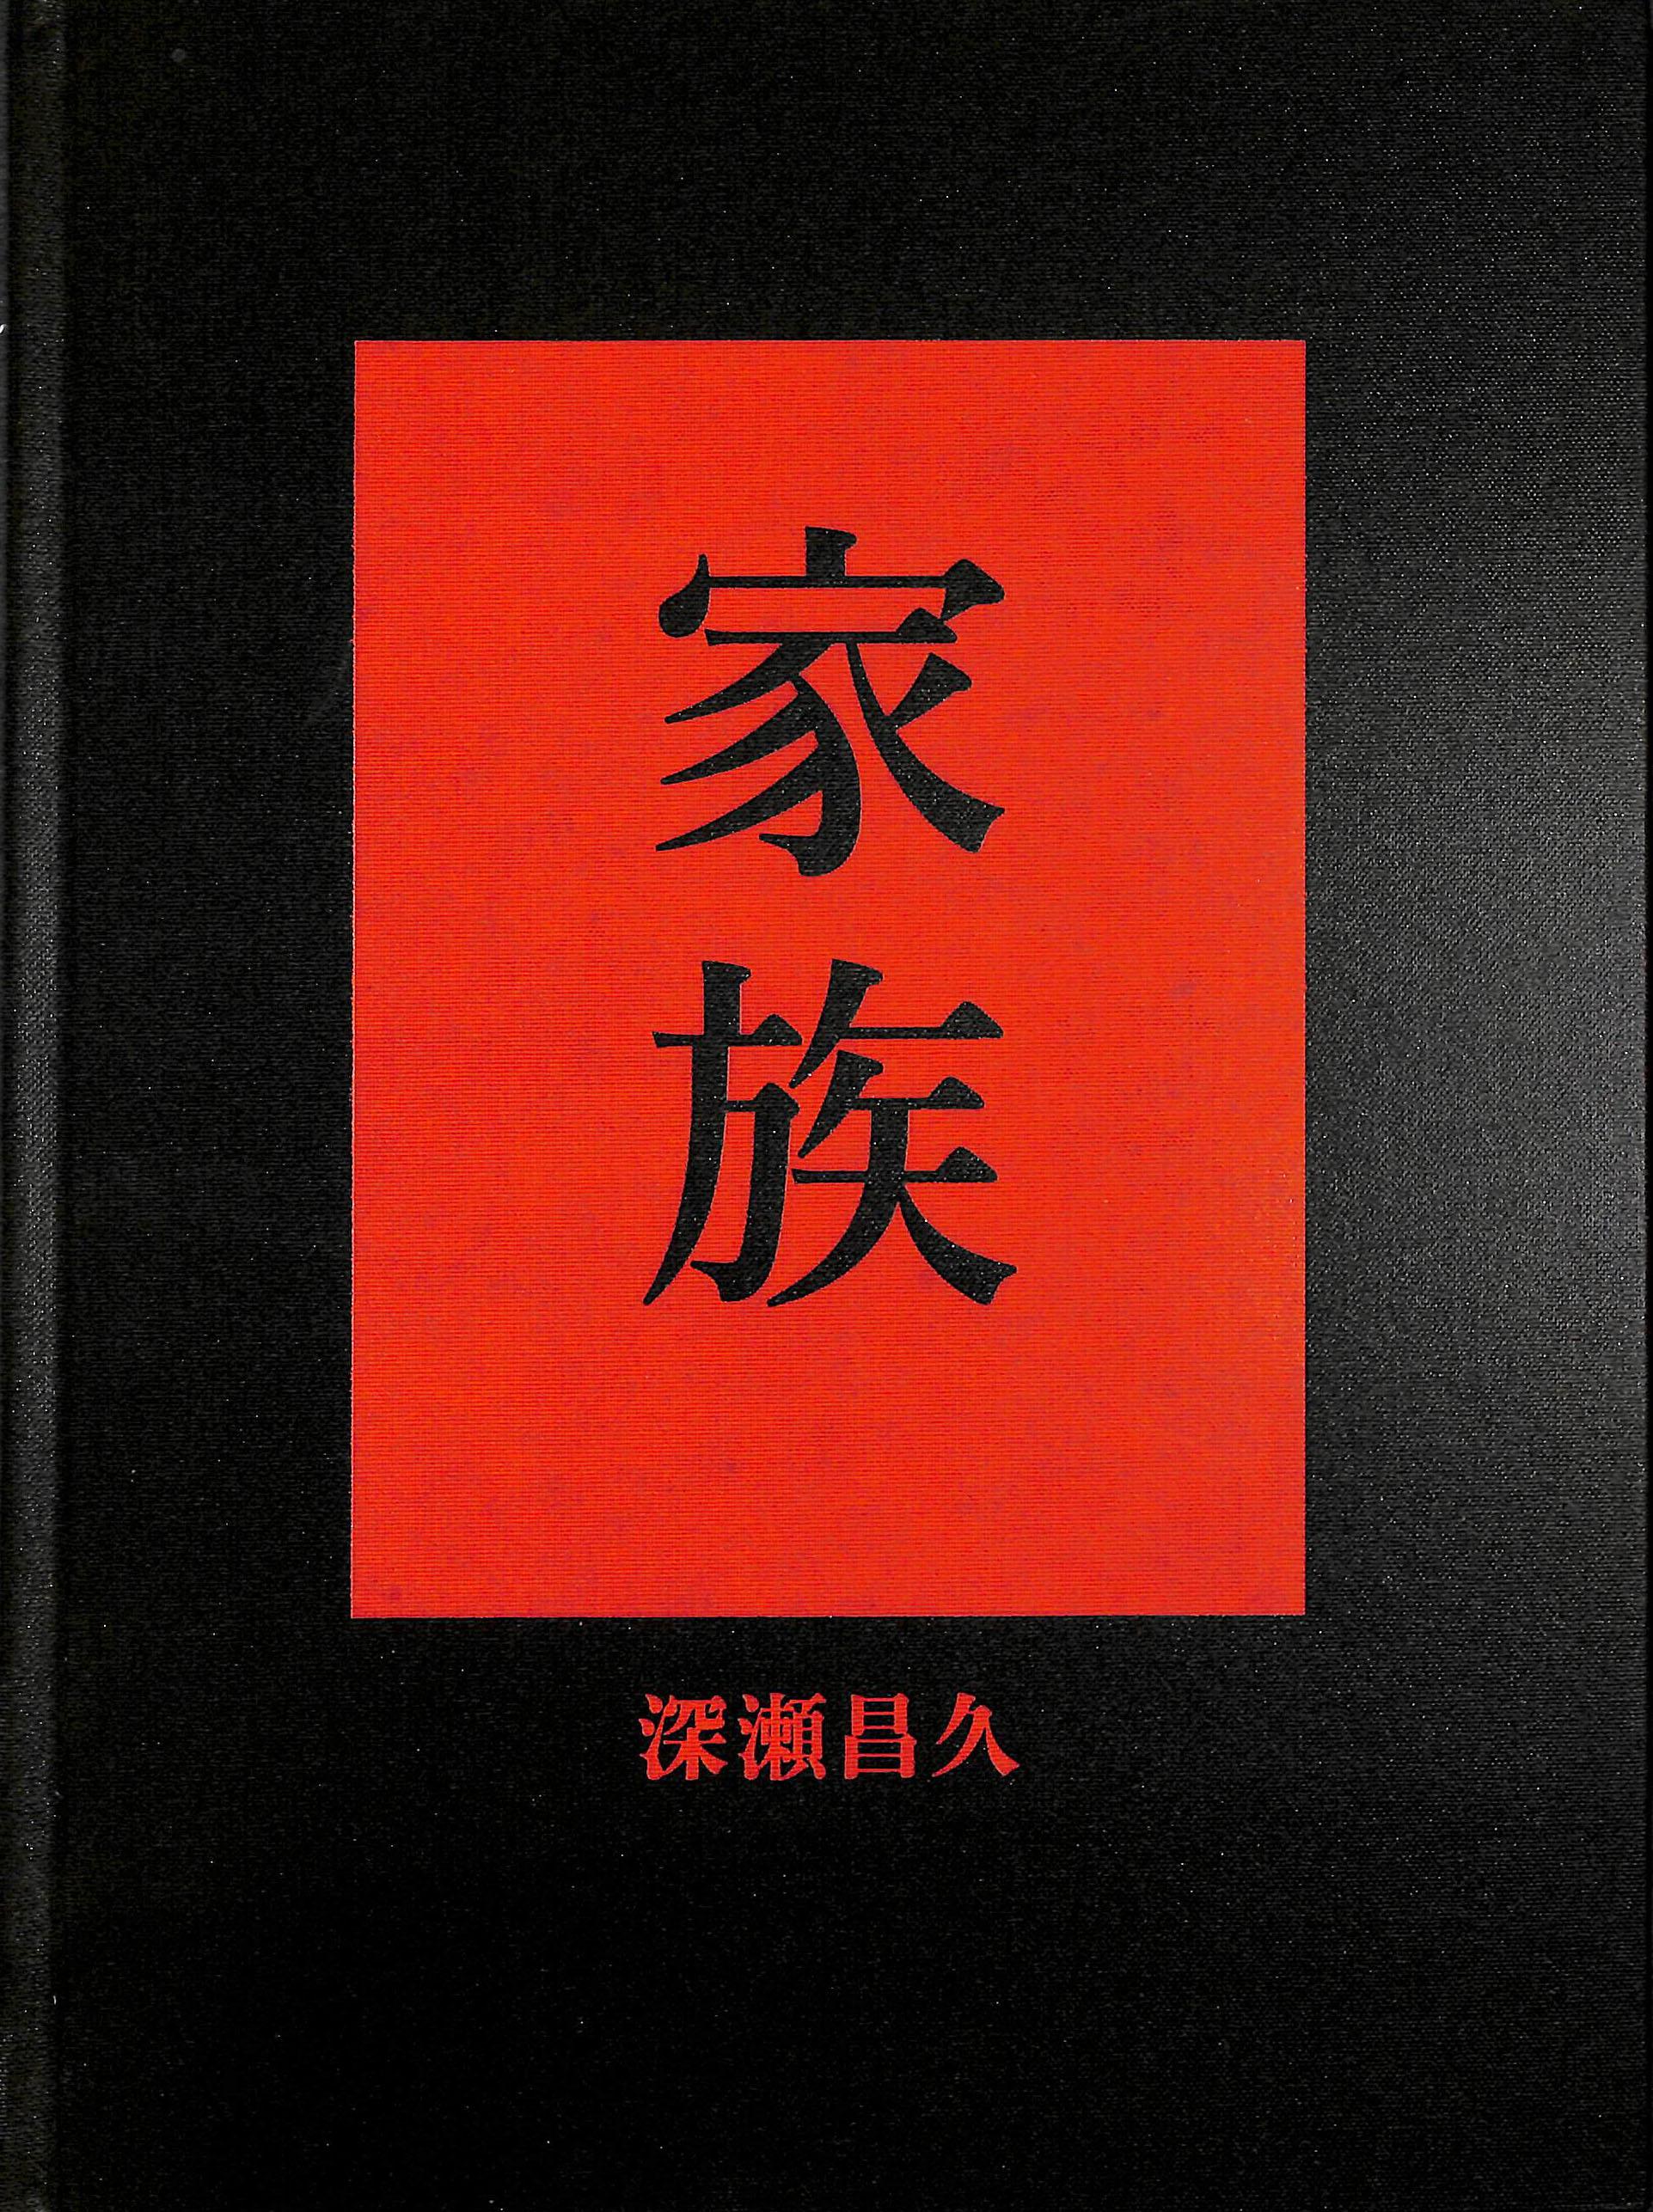 Image for Masahisa Fukase - family